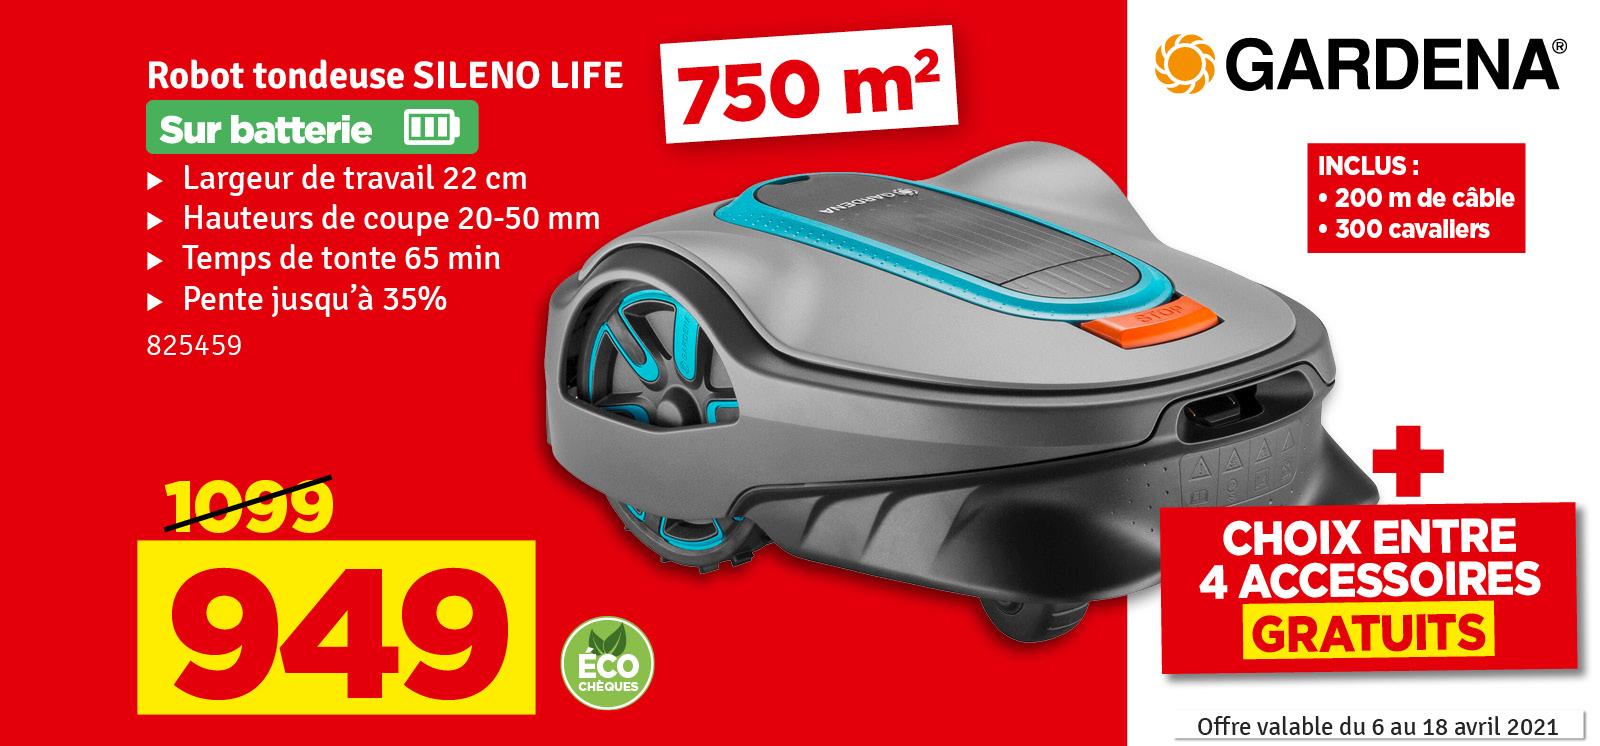 Promo - Tondeuse robot Sileno Life 750 GARDENA